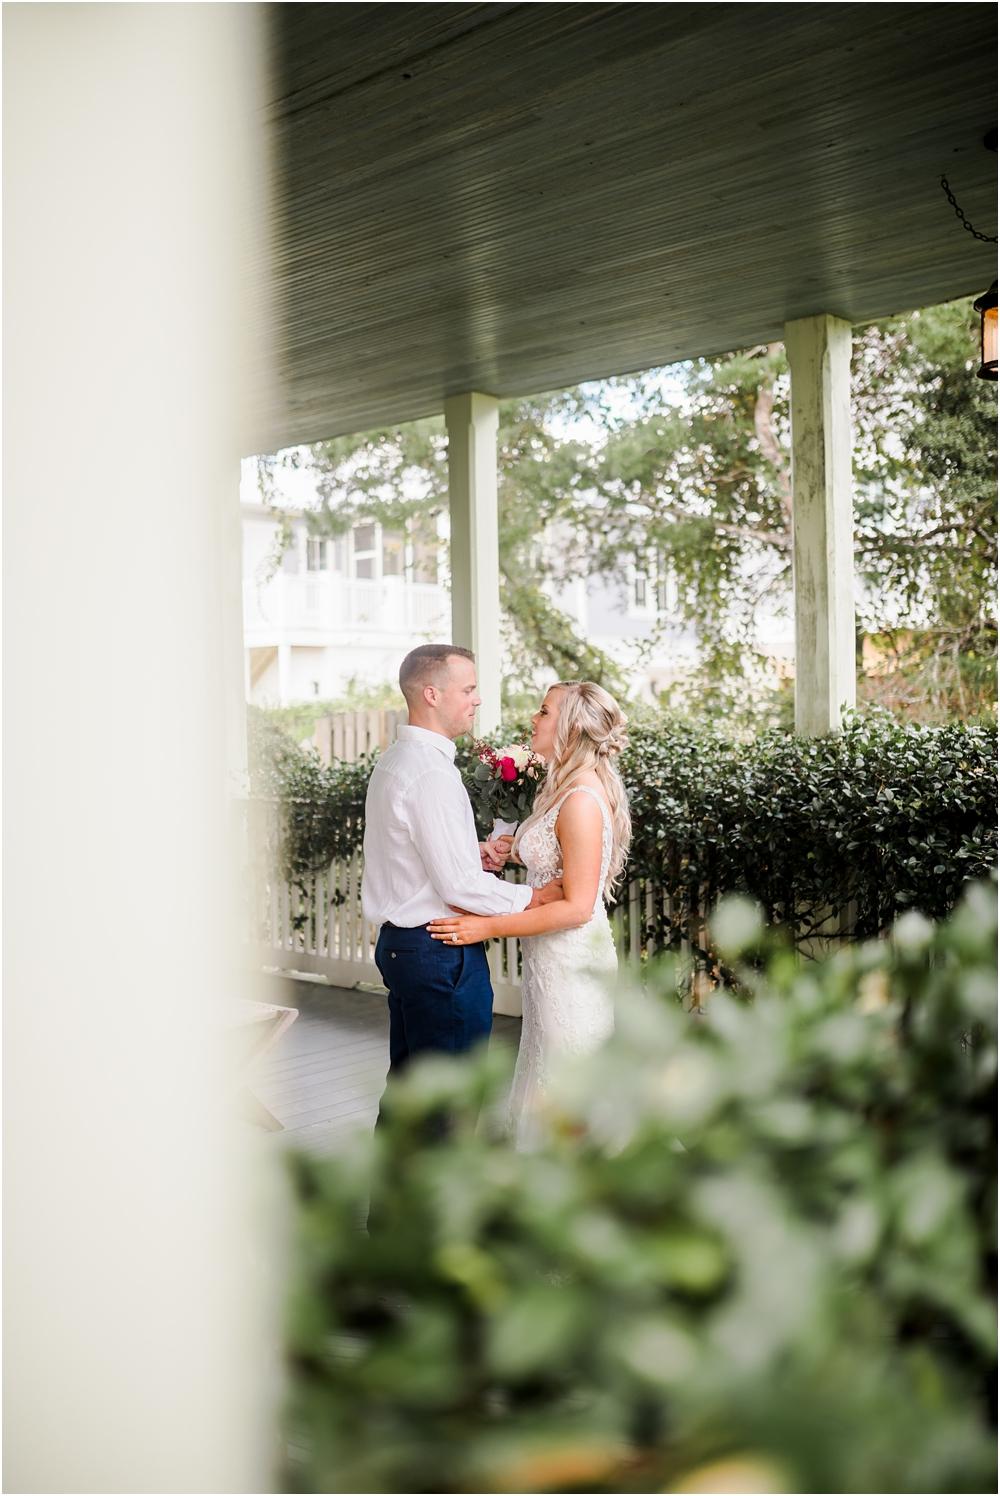 mcglothlin-wedding-kiersten-stevenson-photography-30a-panama-city-beach-dothan-tallahassee-(51-of-145).jpg